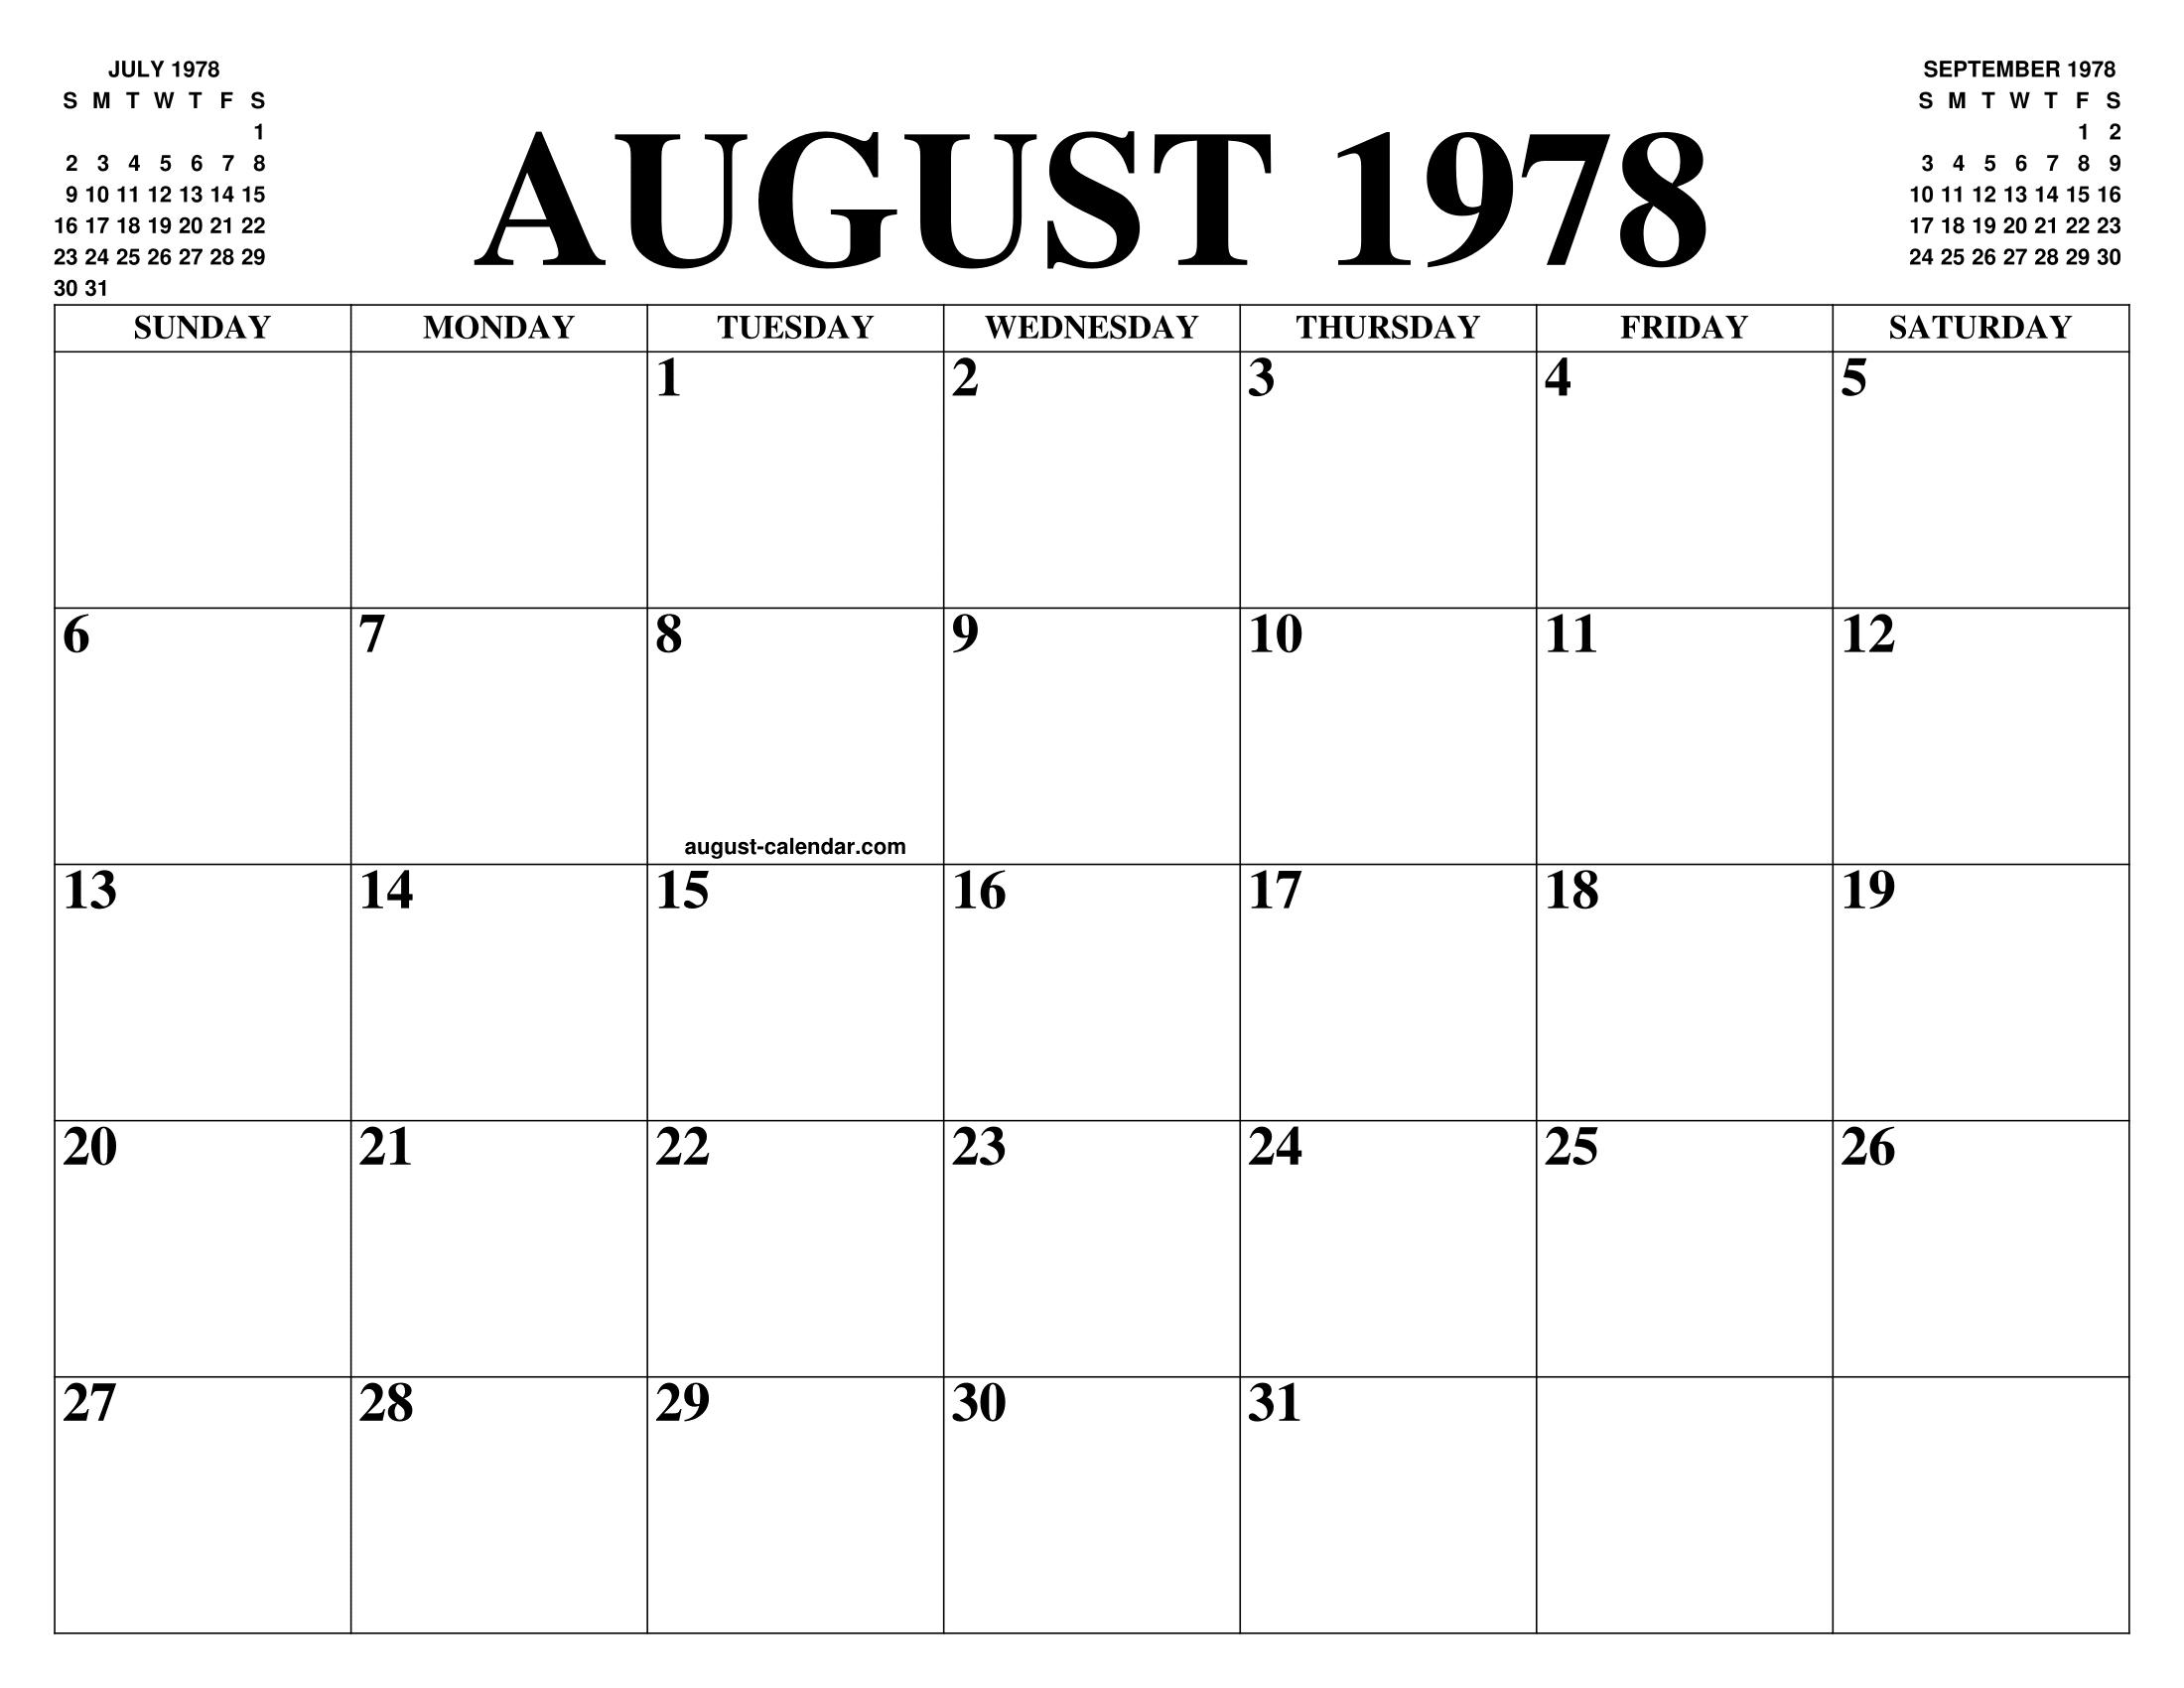 1978 Calendario.August 1978 Calendar Of The Month Free Printable August